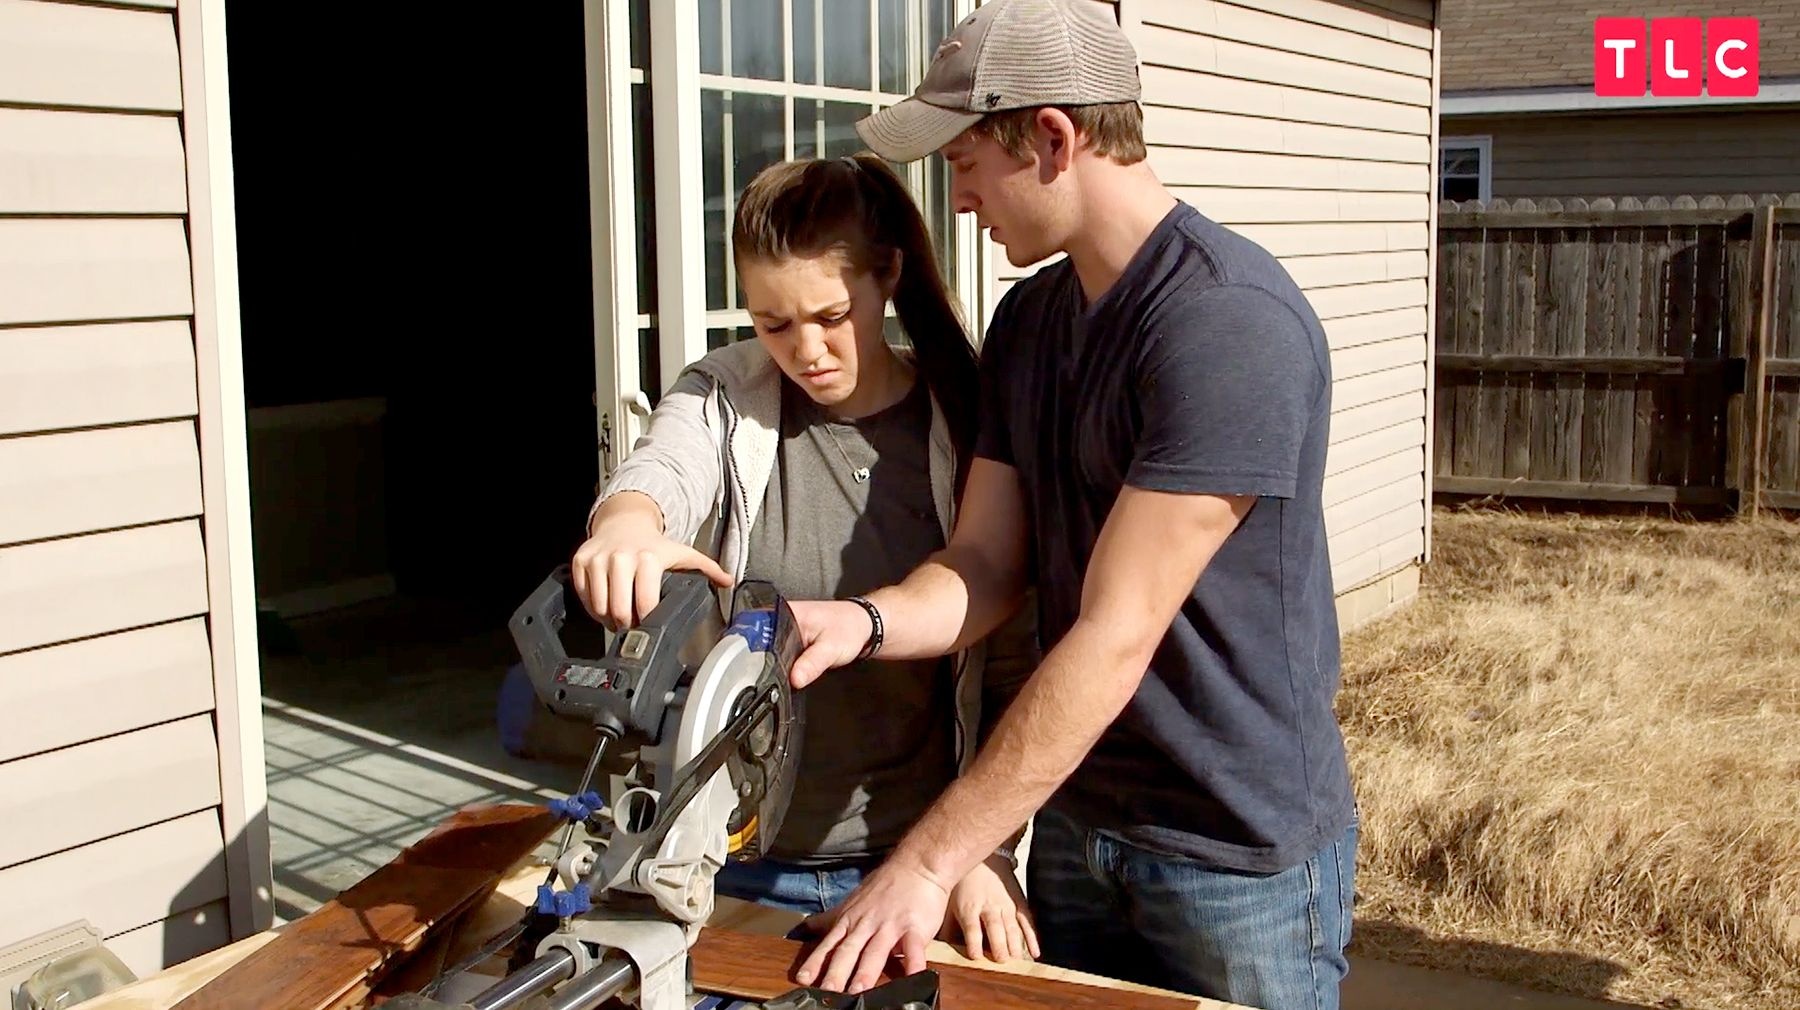 Joy-Anna and Austin sawing